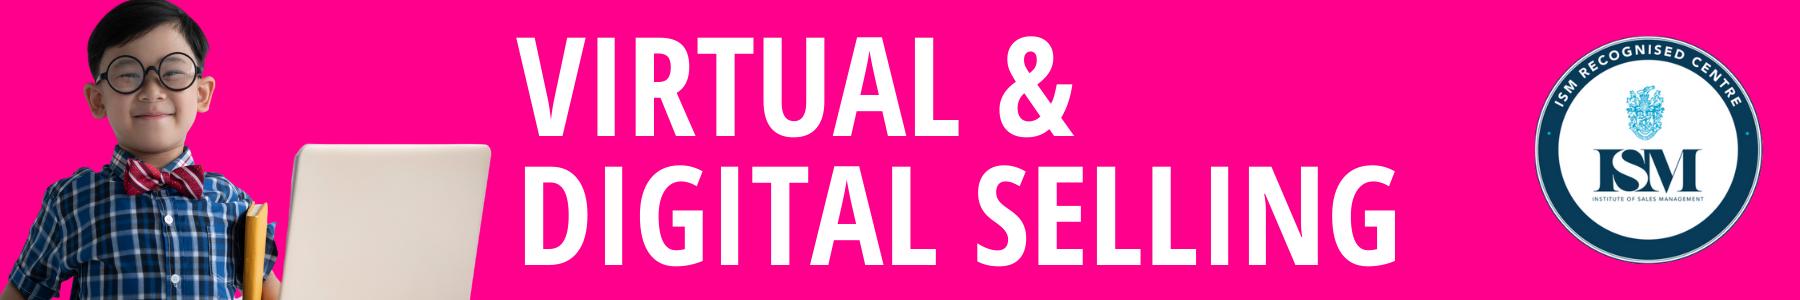 virtual and digital selling